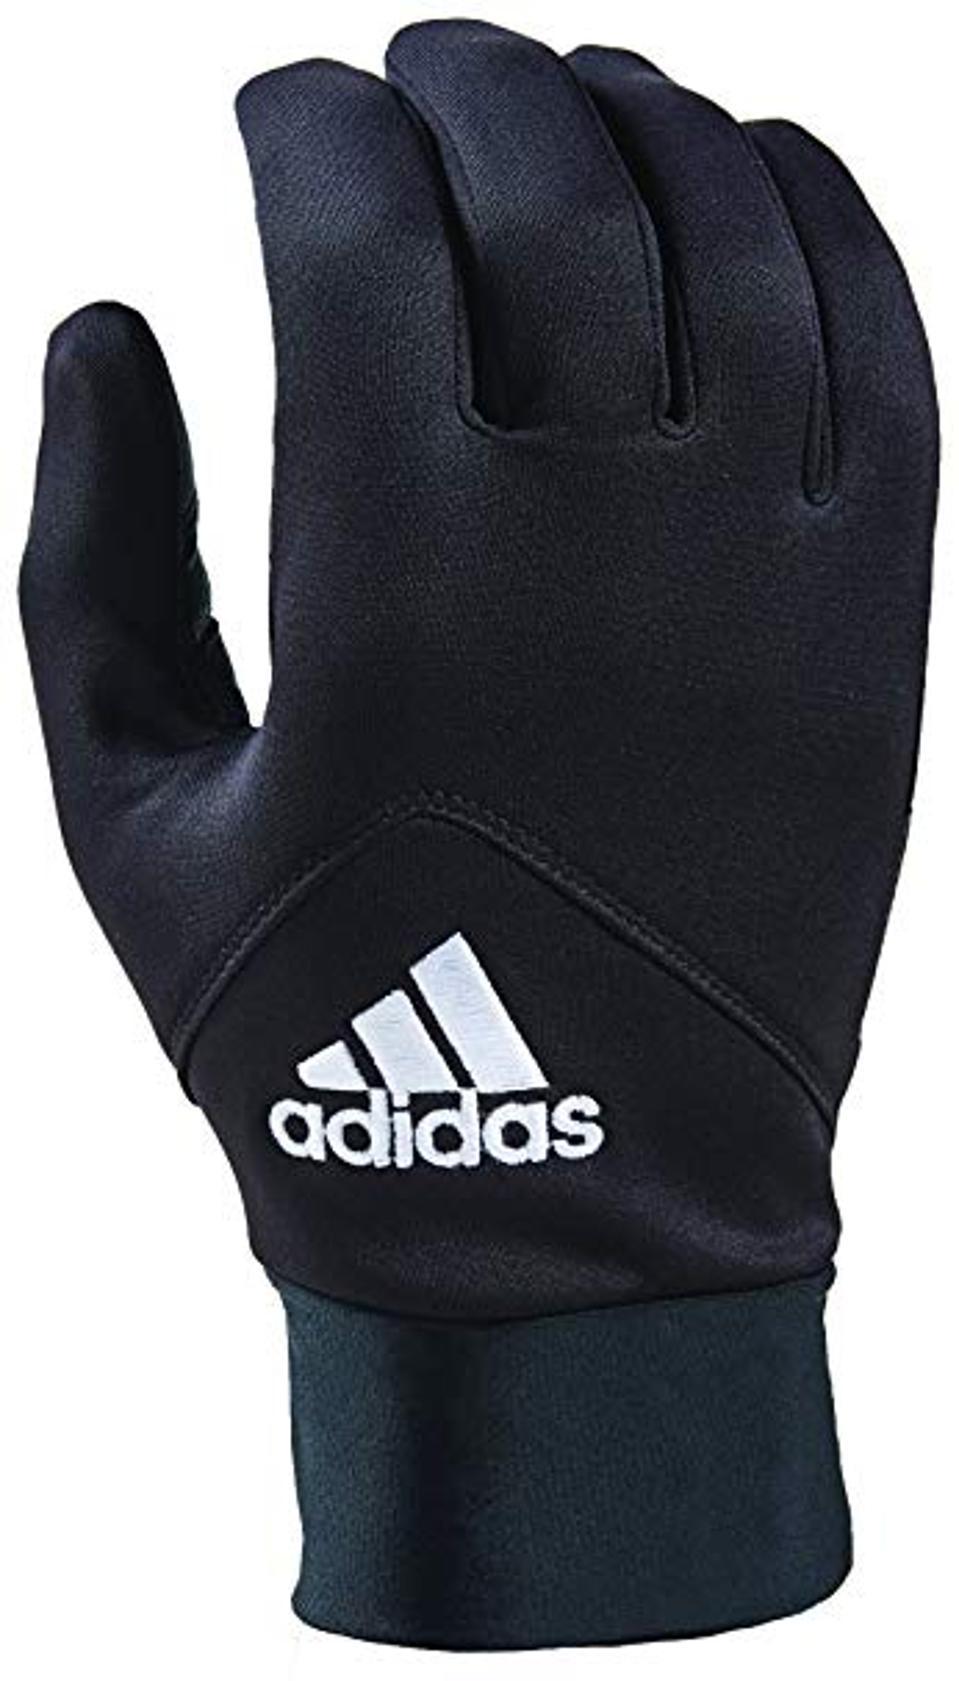 Adidas AWP Shield Running Gloves